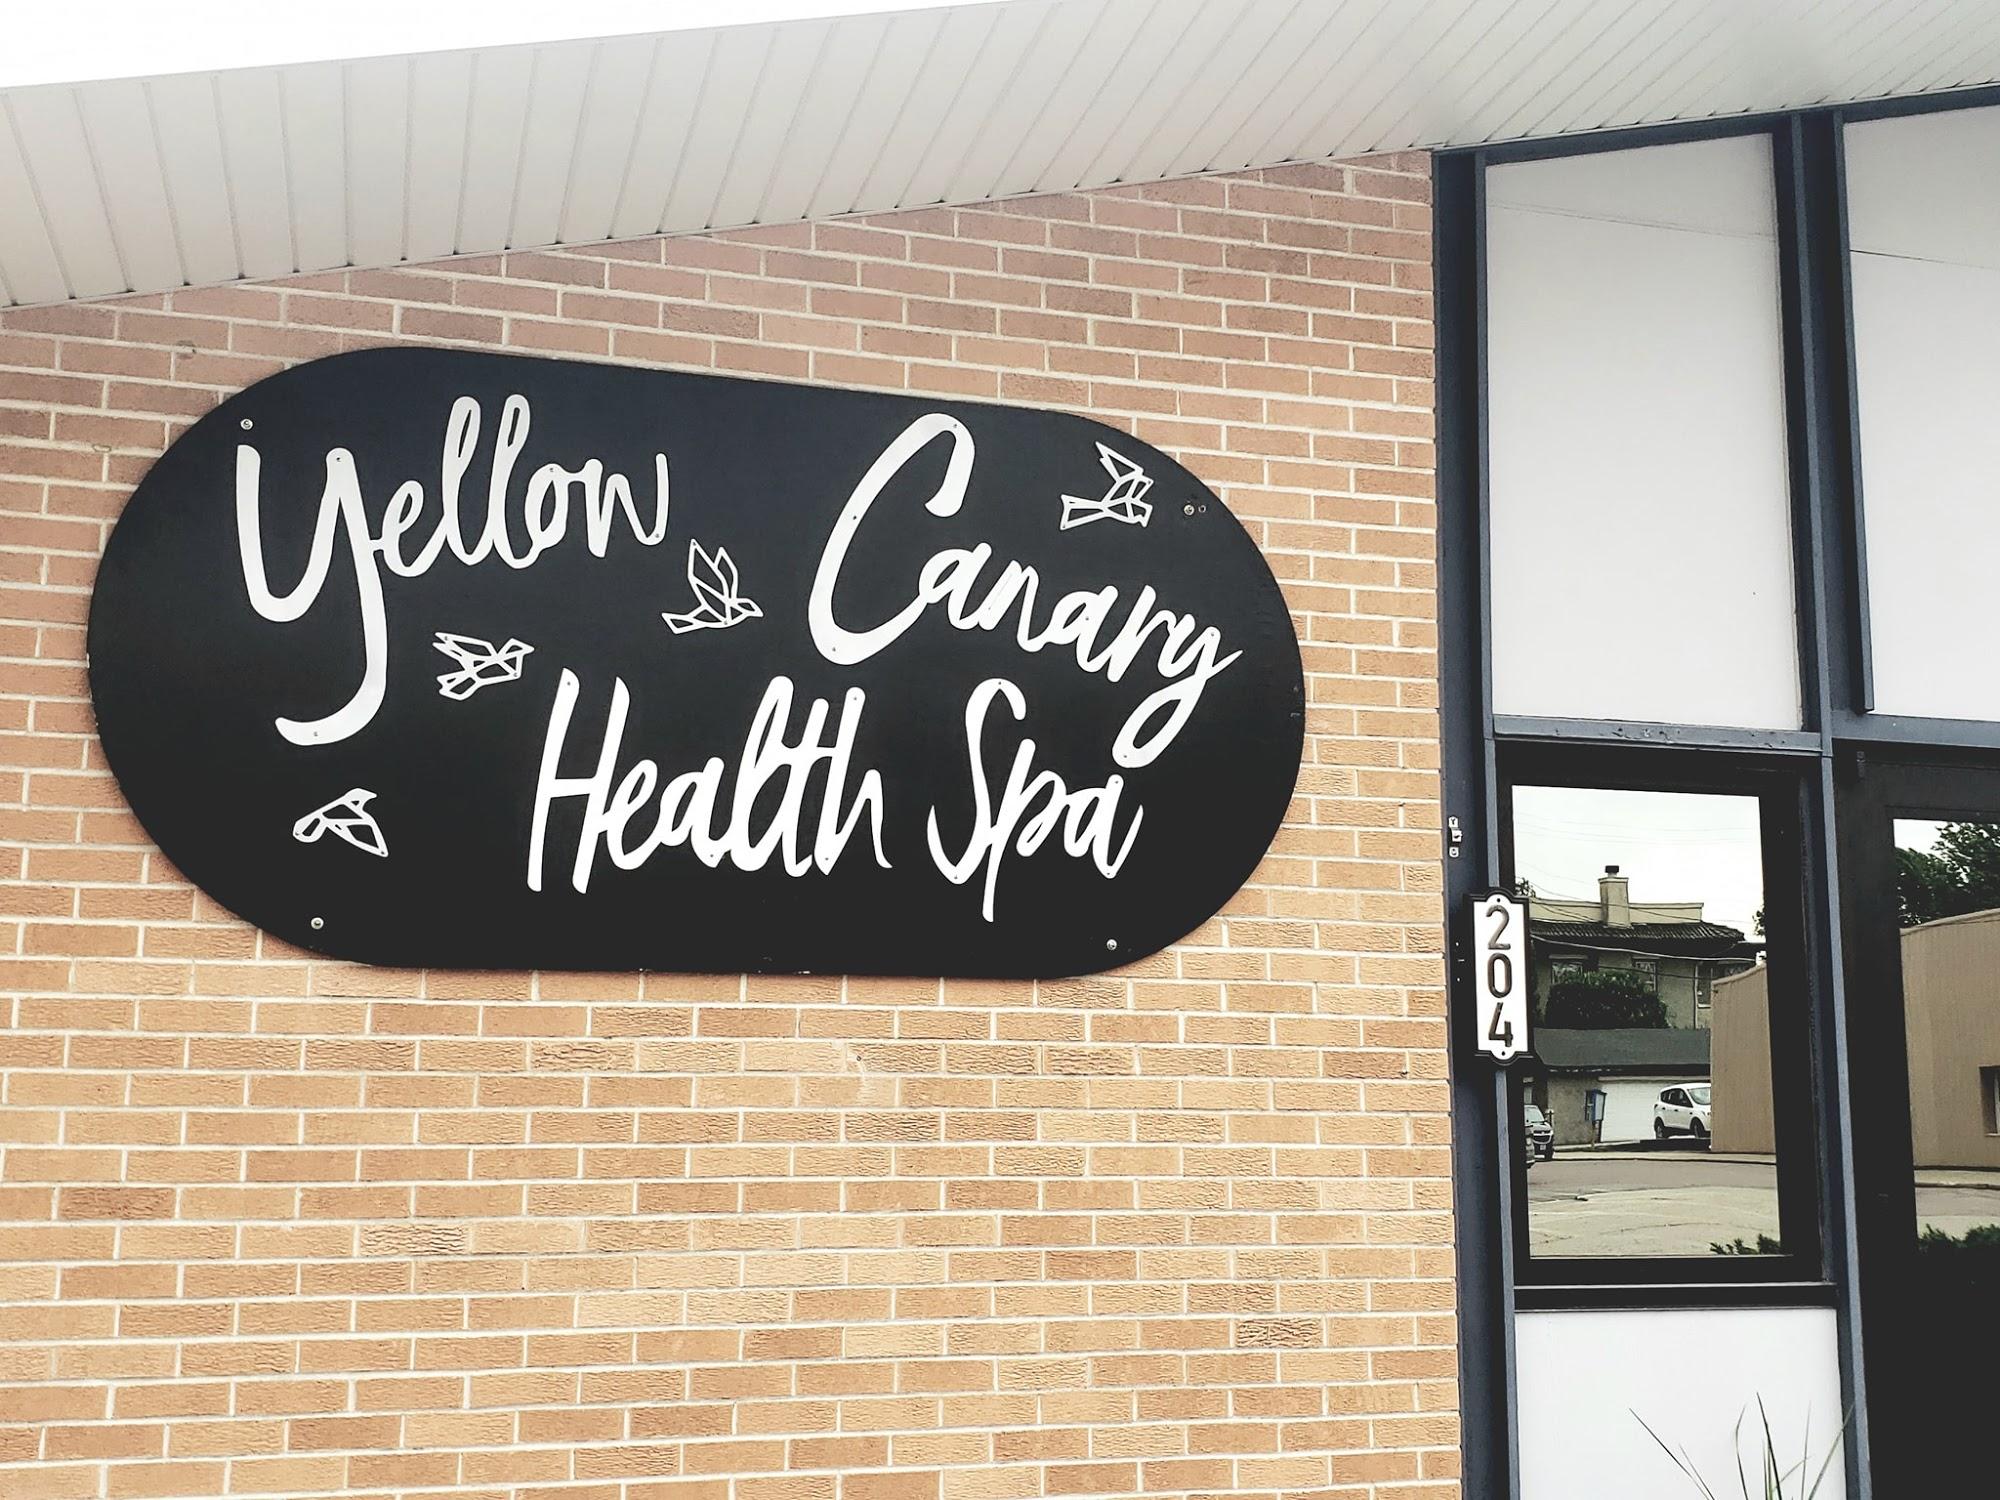 Yellow Canary Health Spa 204 N Idaho St, Glidden